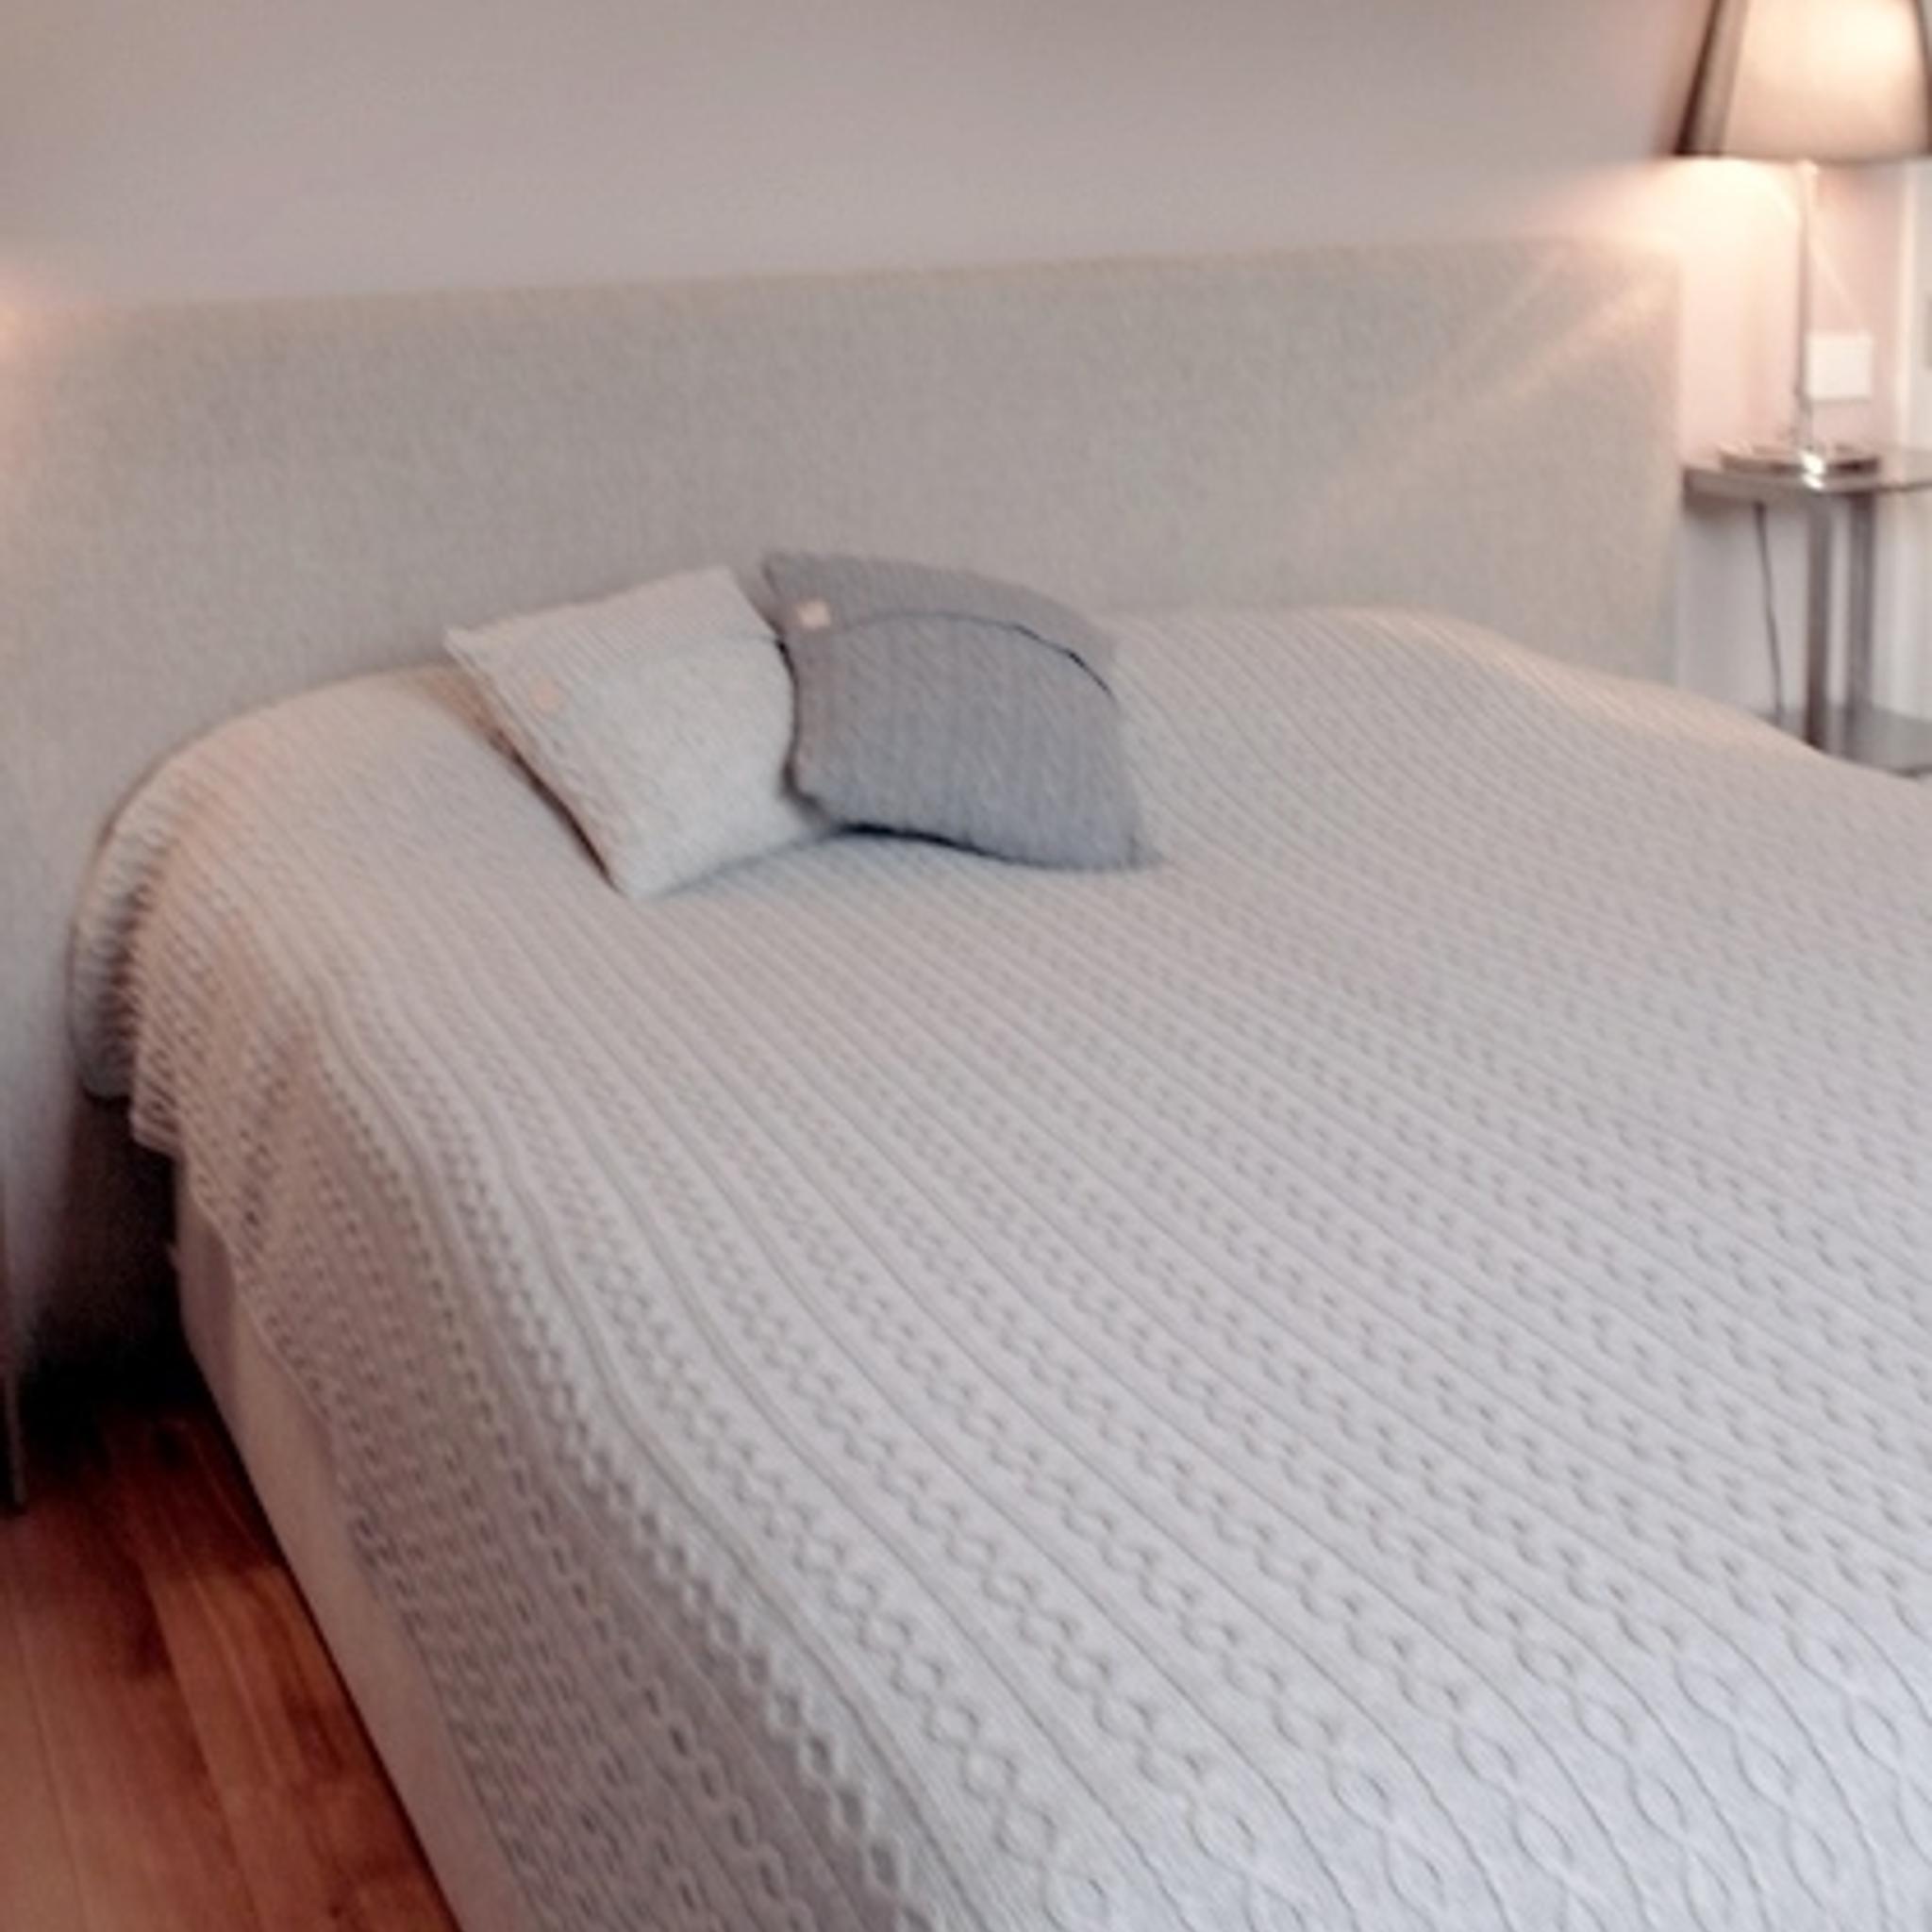 Tagesdecke & Bettüberwurf 220x240 cm weiß